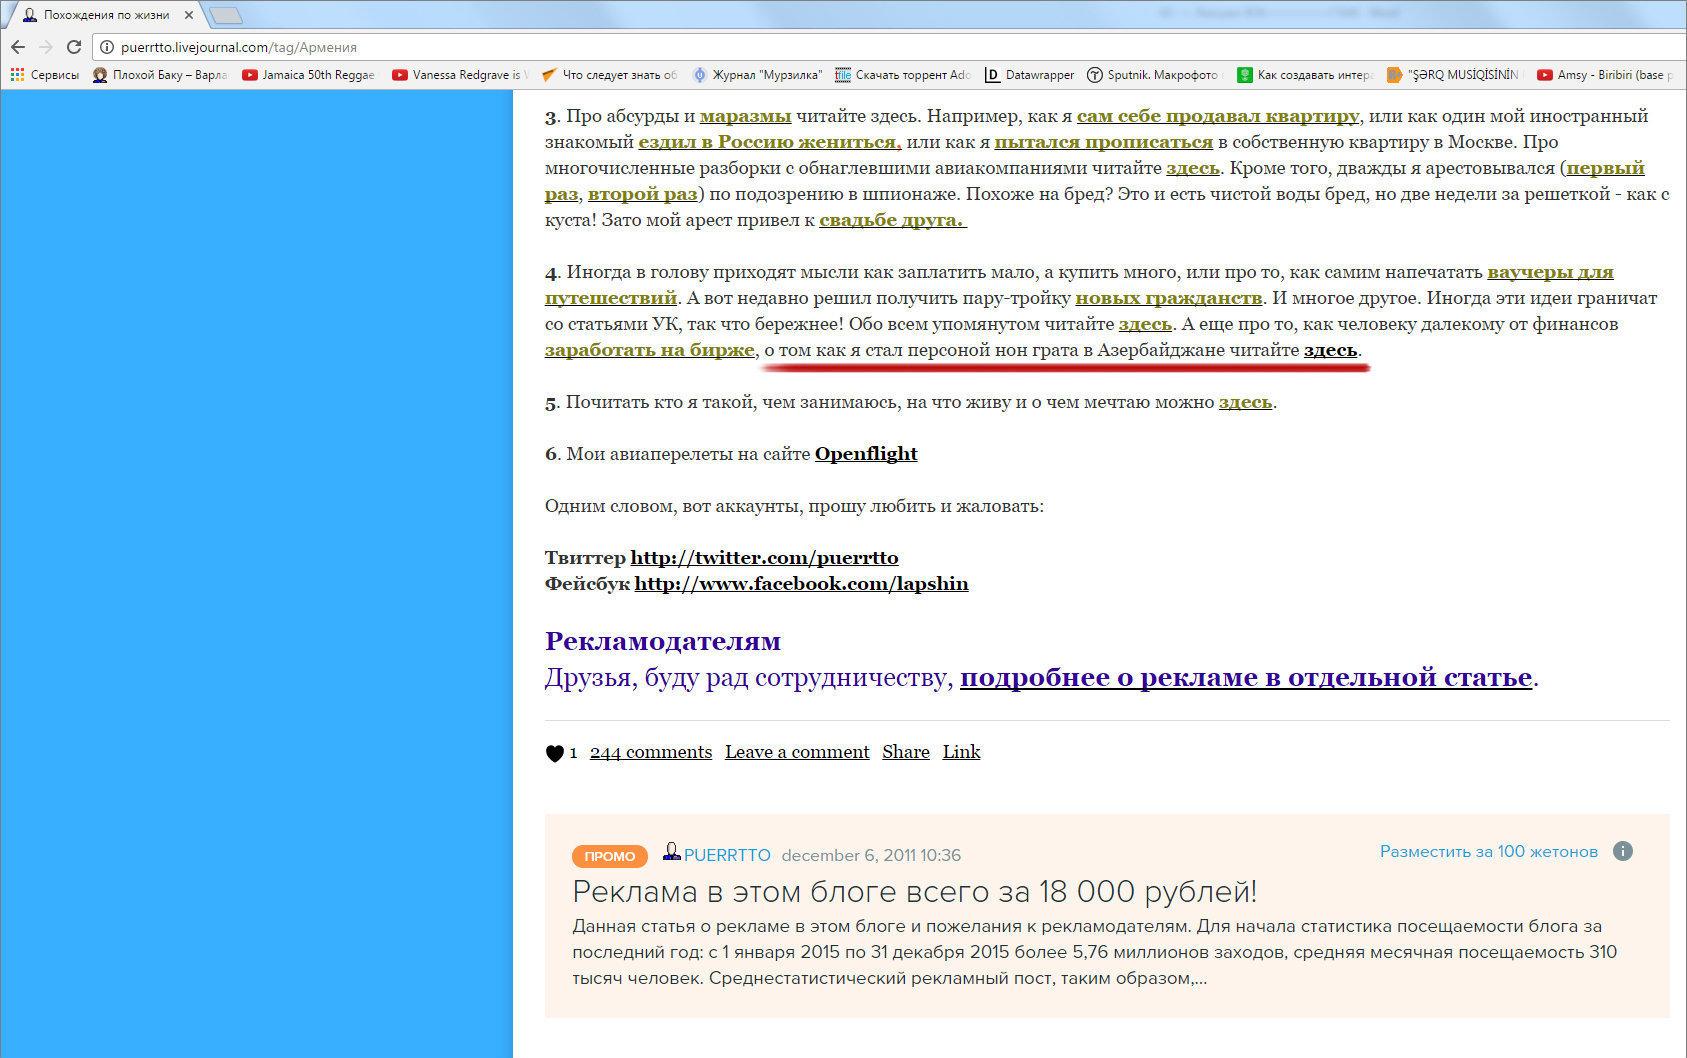 Блог Александра Лапшина в Живом журнале